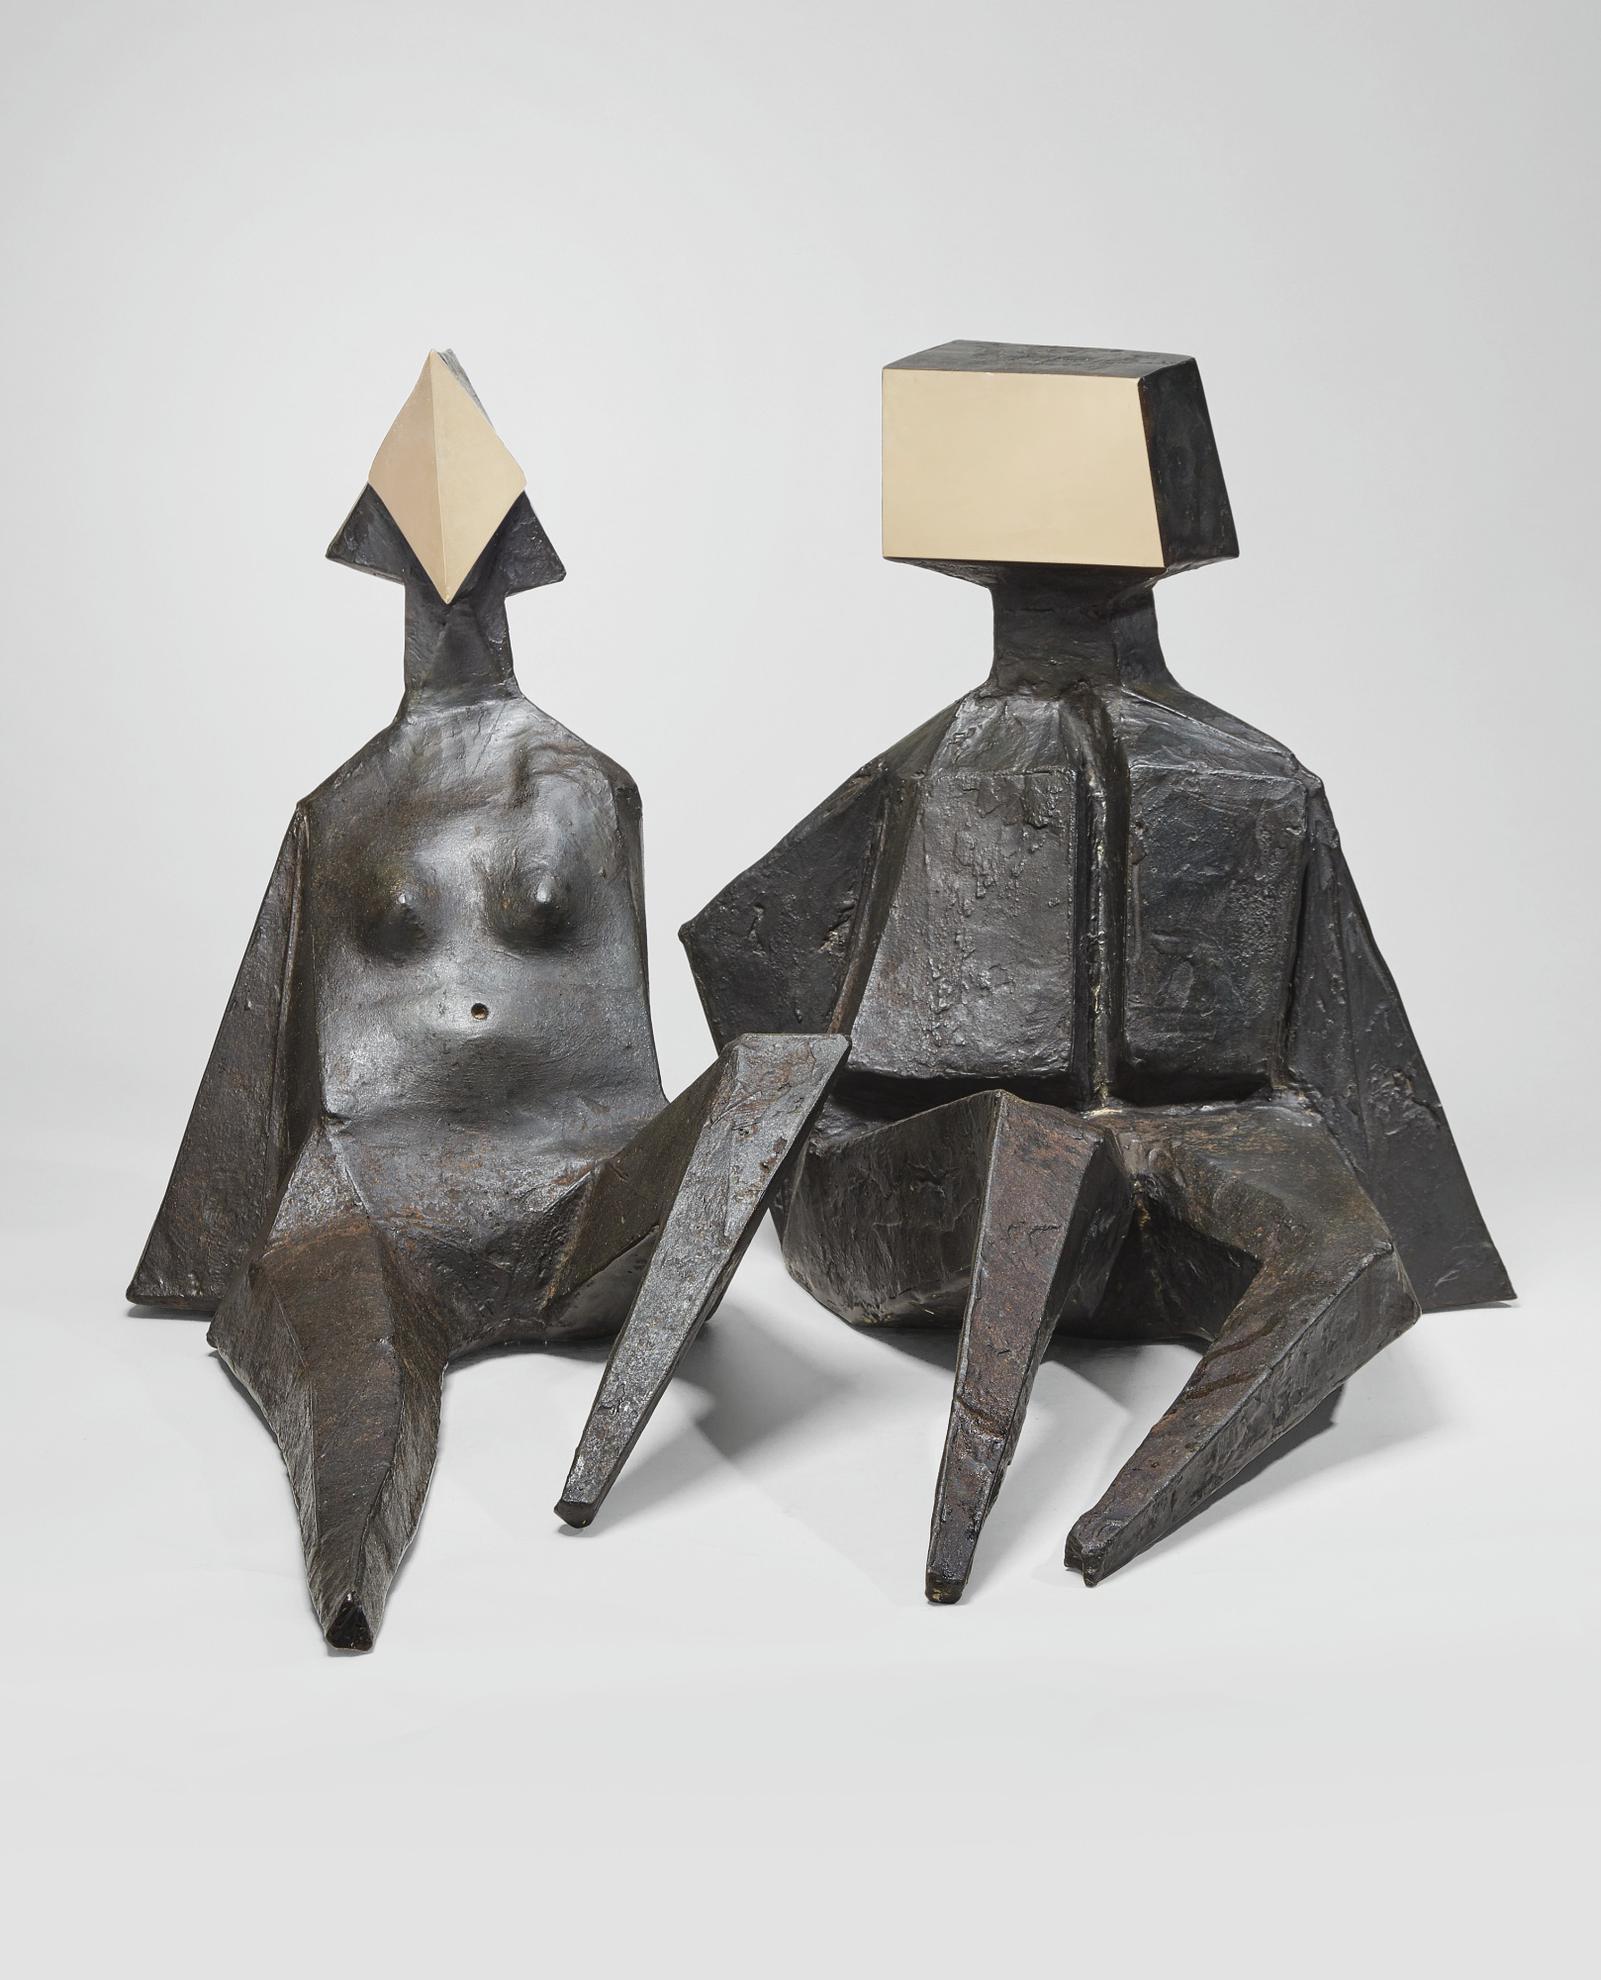 Lynn Chadwick-Pair Of Sitting Figures V-1973